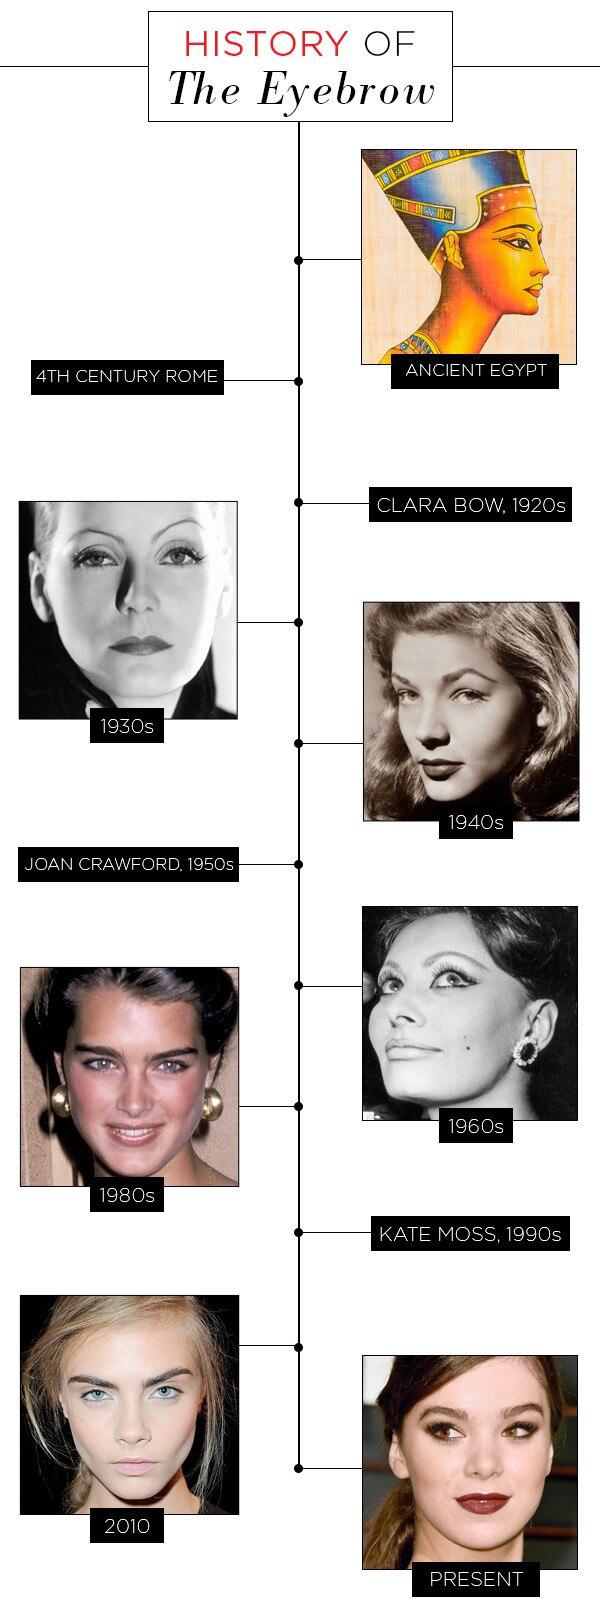 ESC, History of the Eyebrow